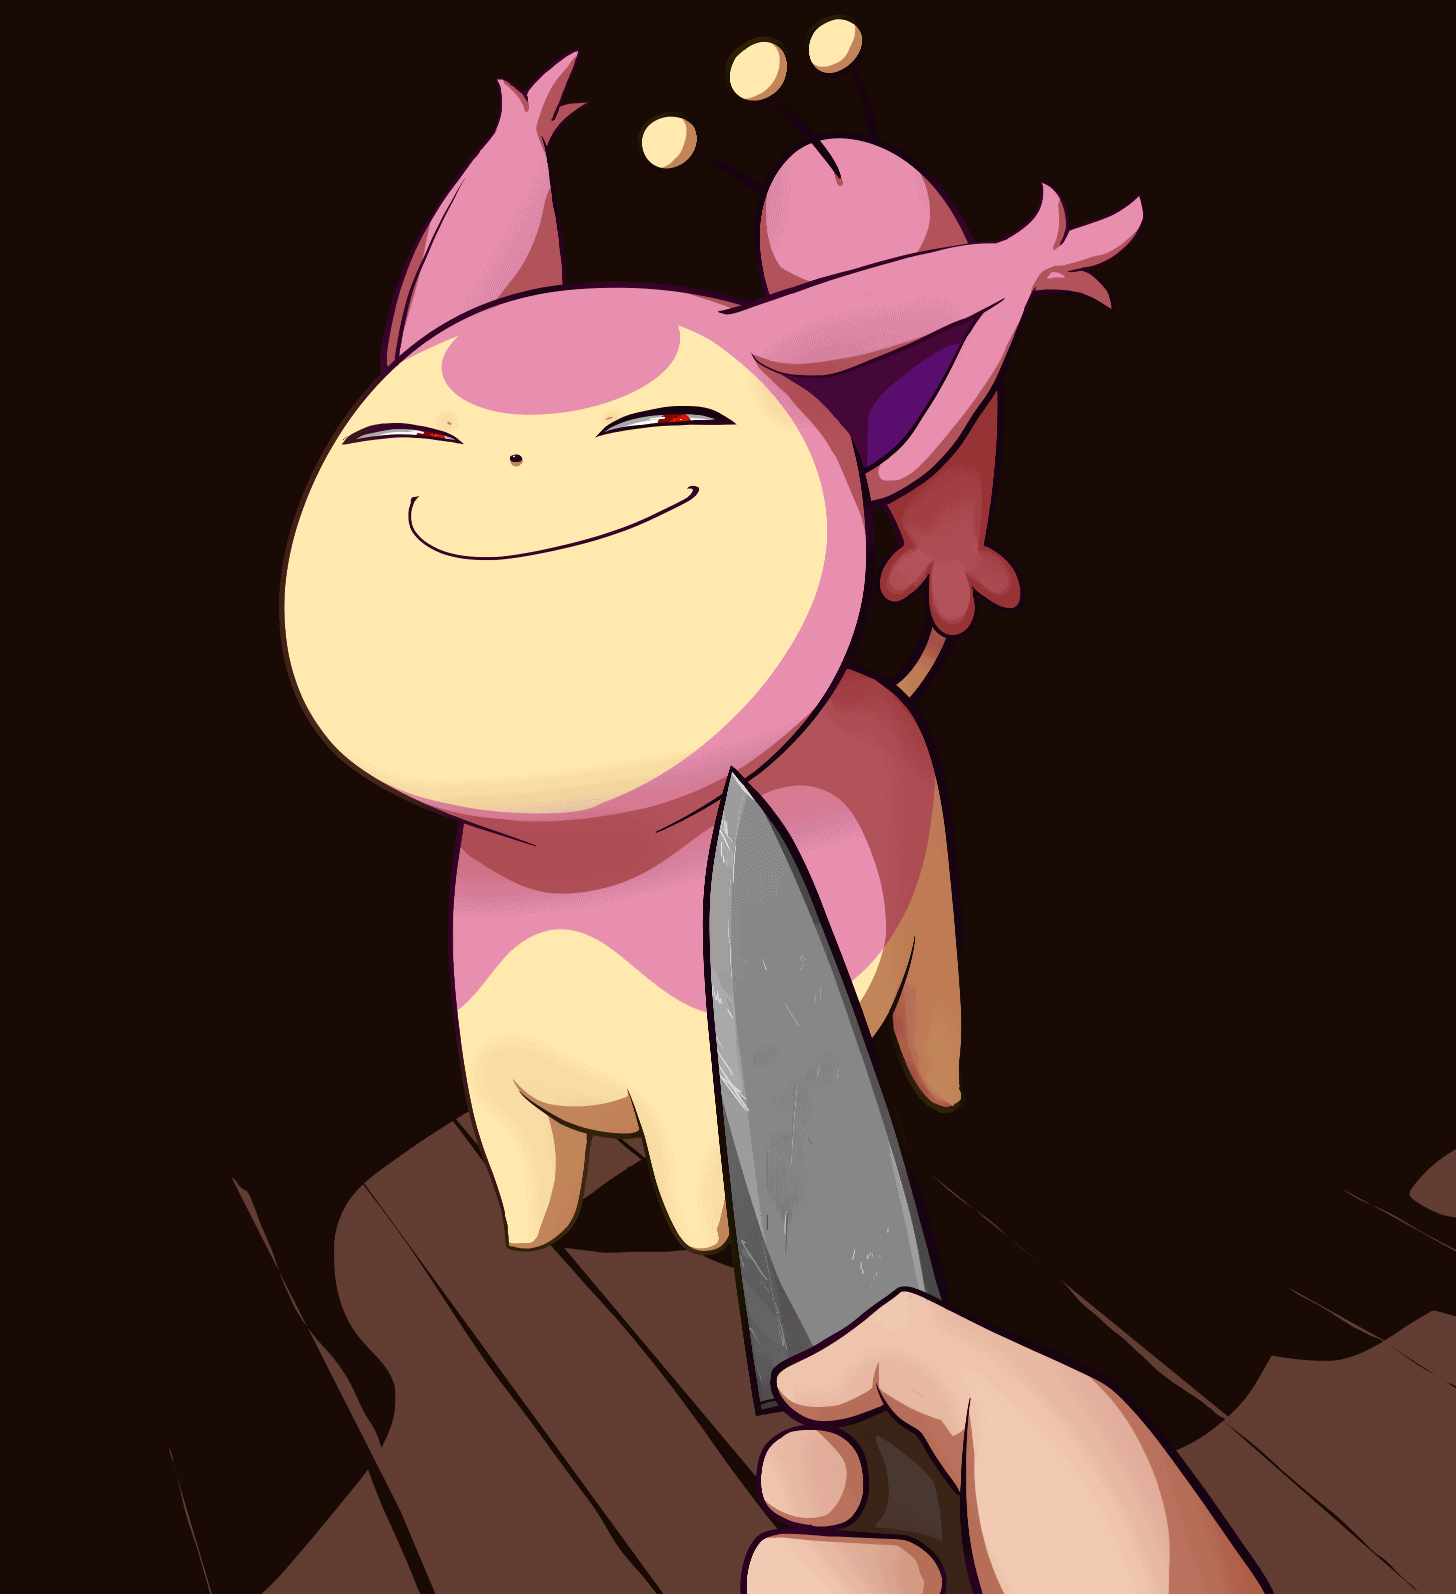 Knife Cat Meme Joke Image 04